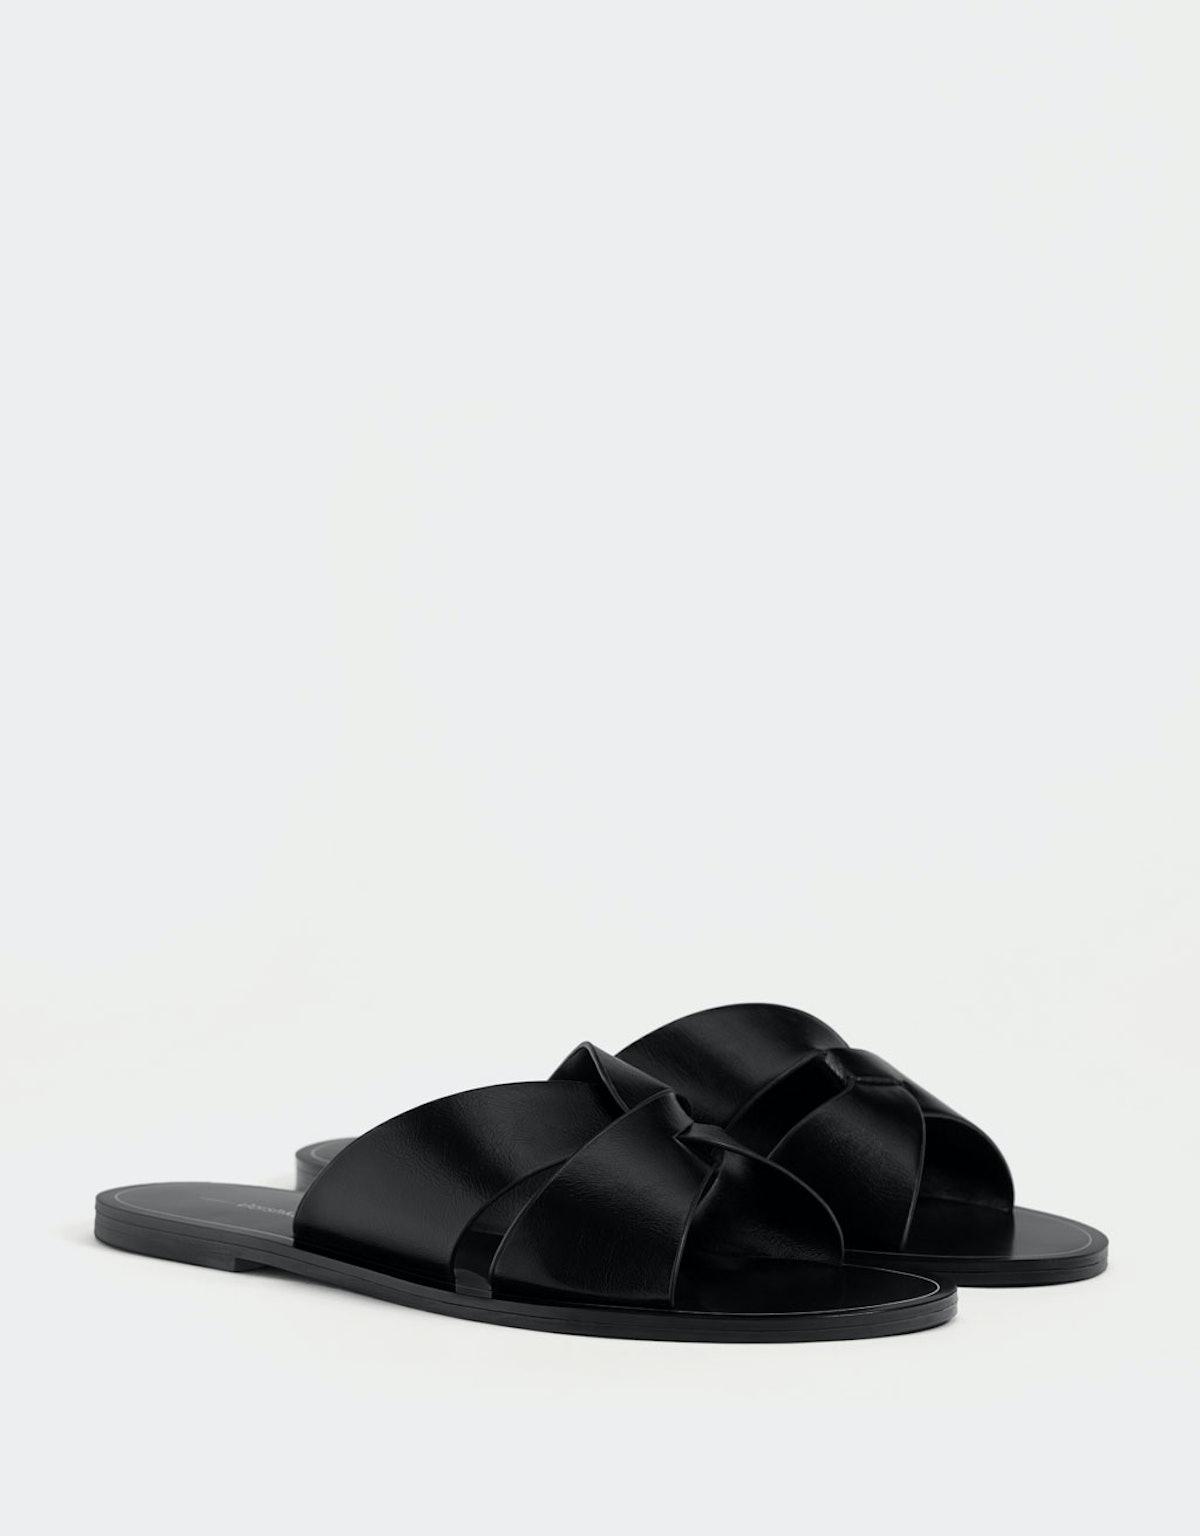 Criss-cross strap slides